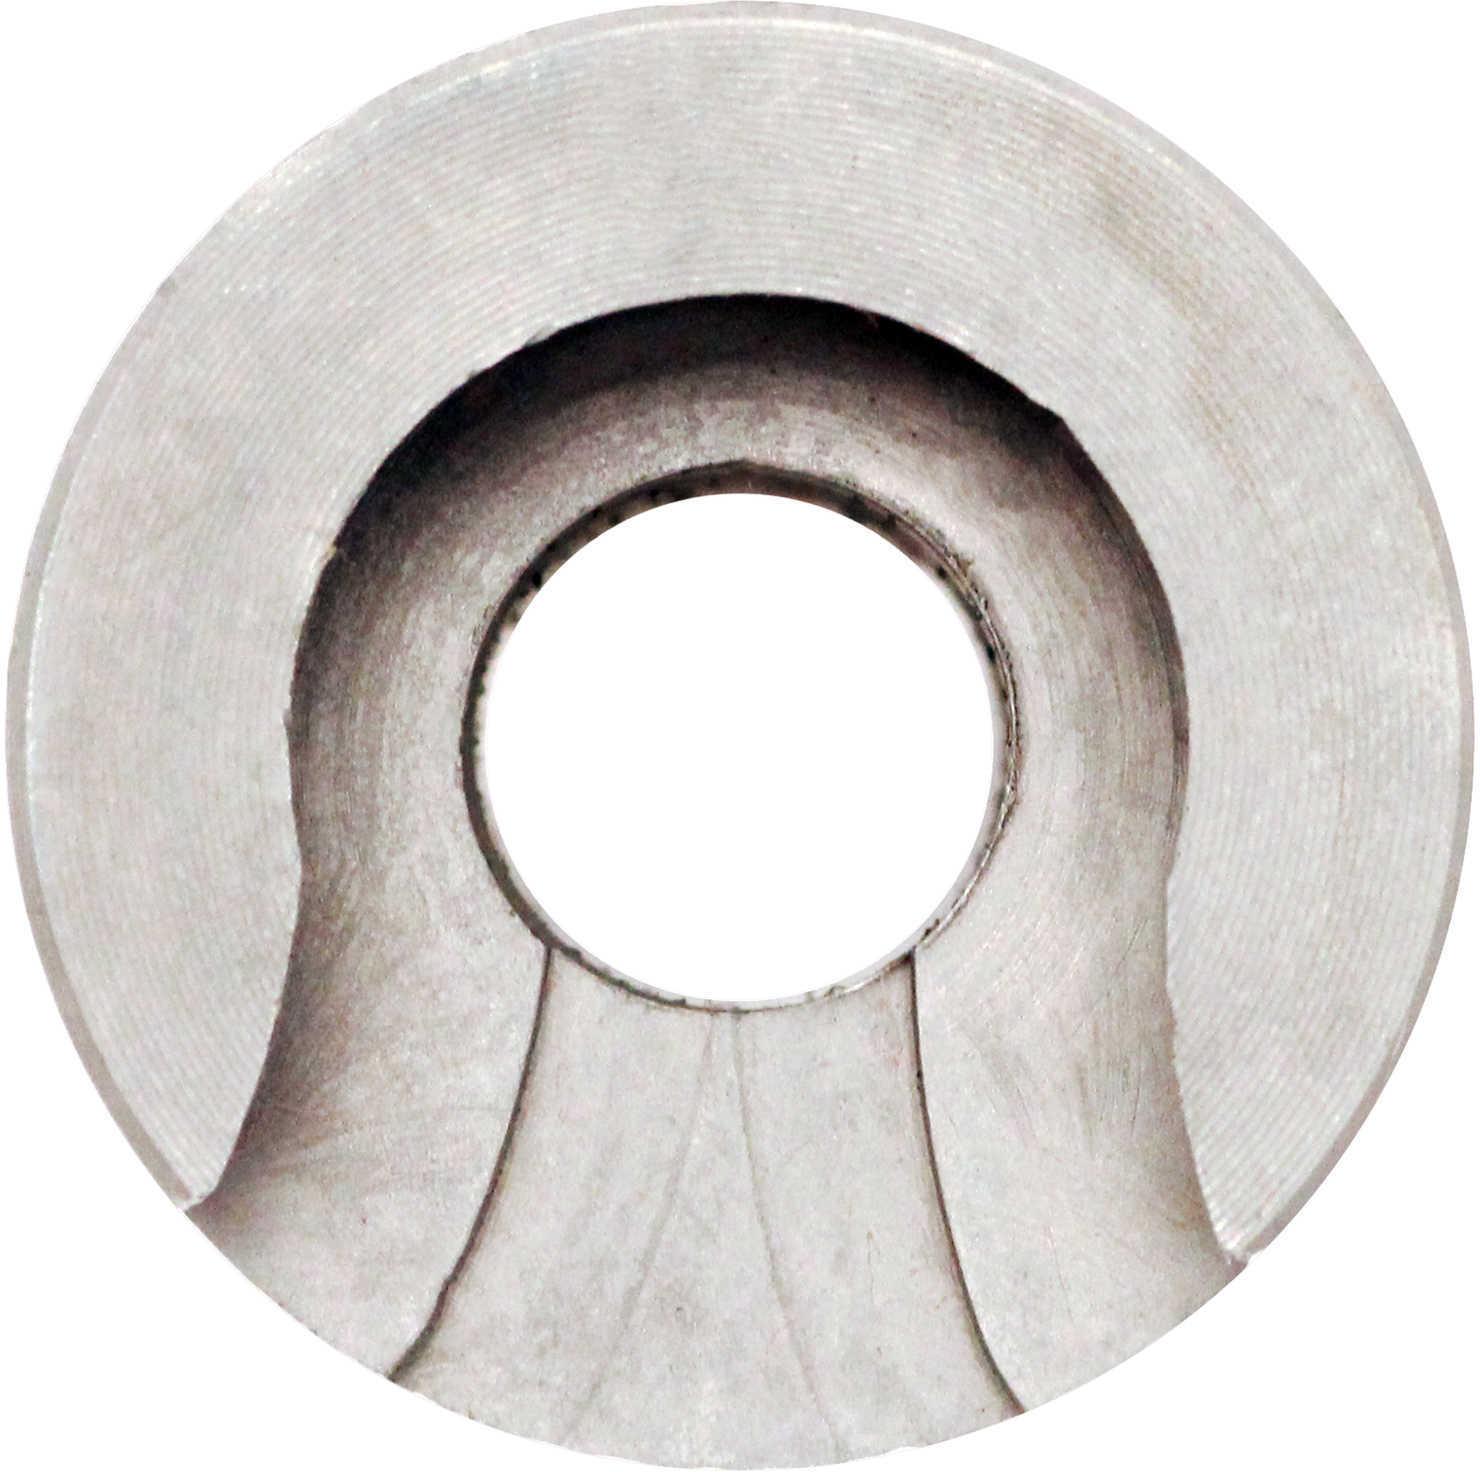 Hornady Shell Holder Size 8 Md: 390548